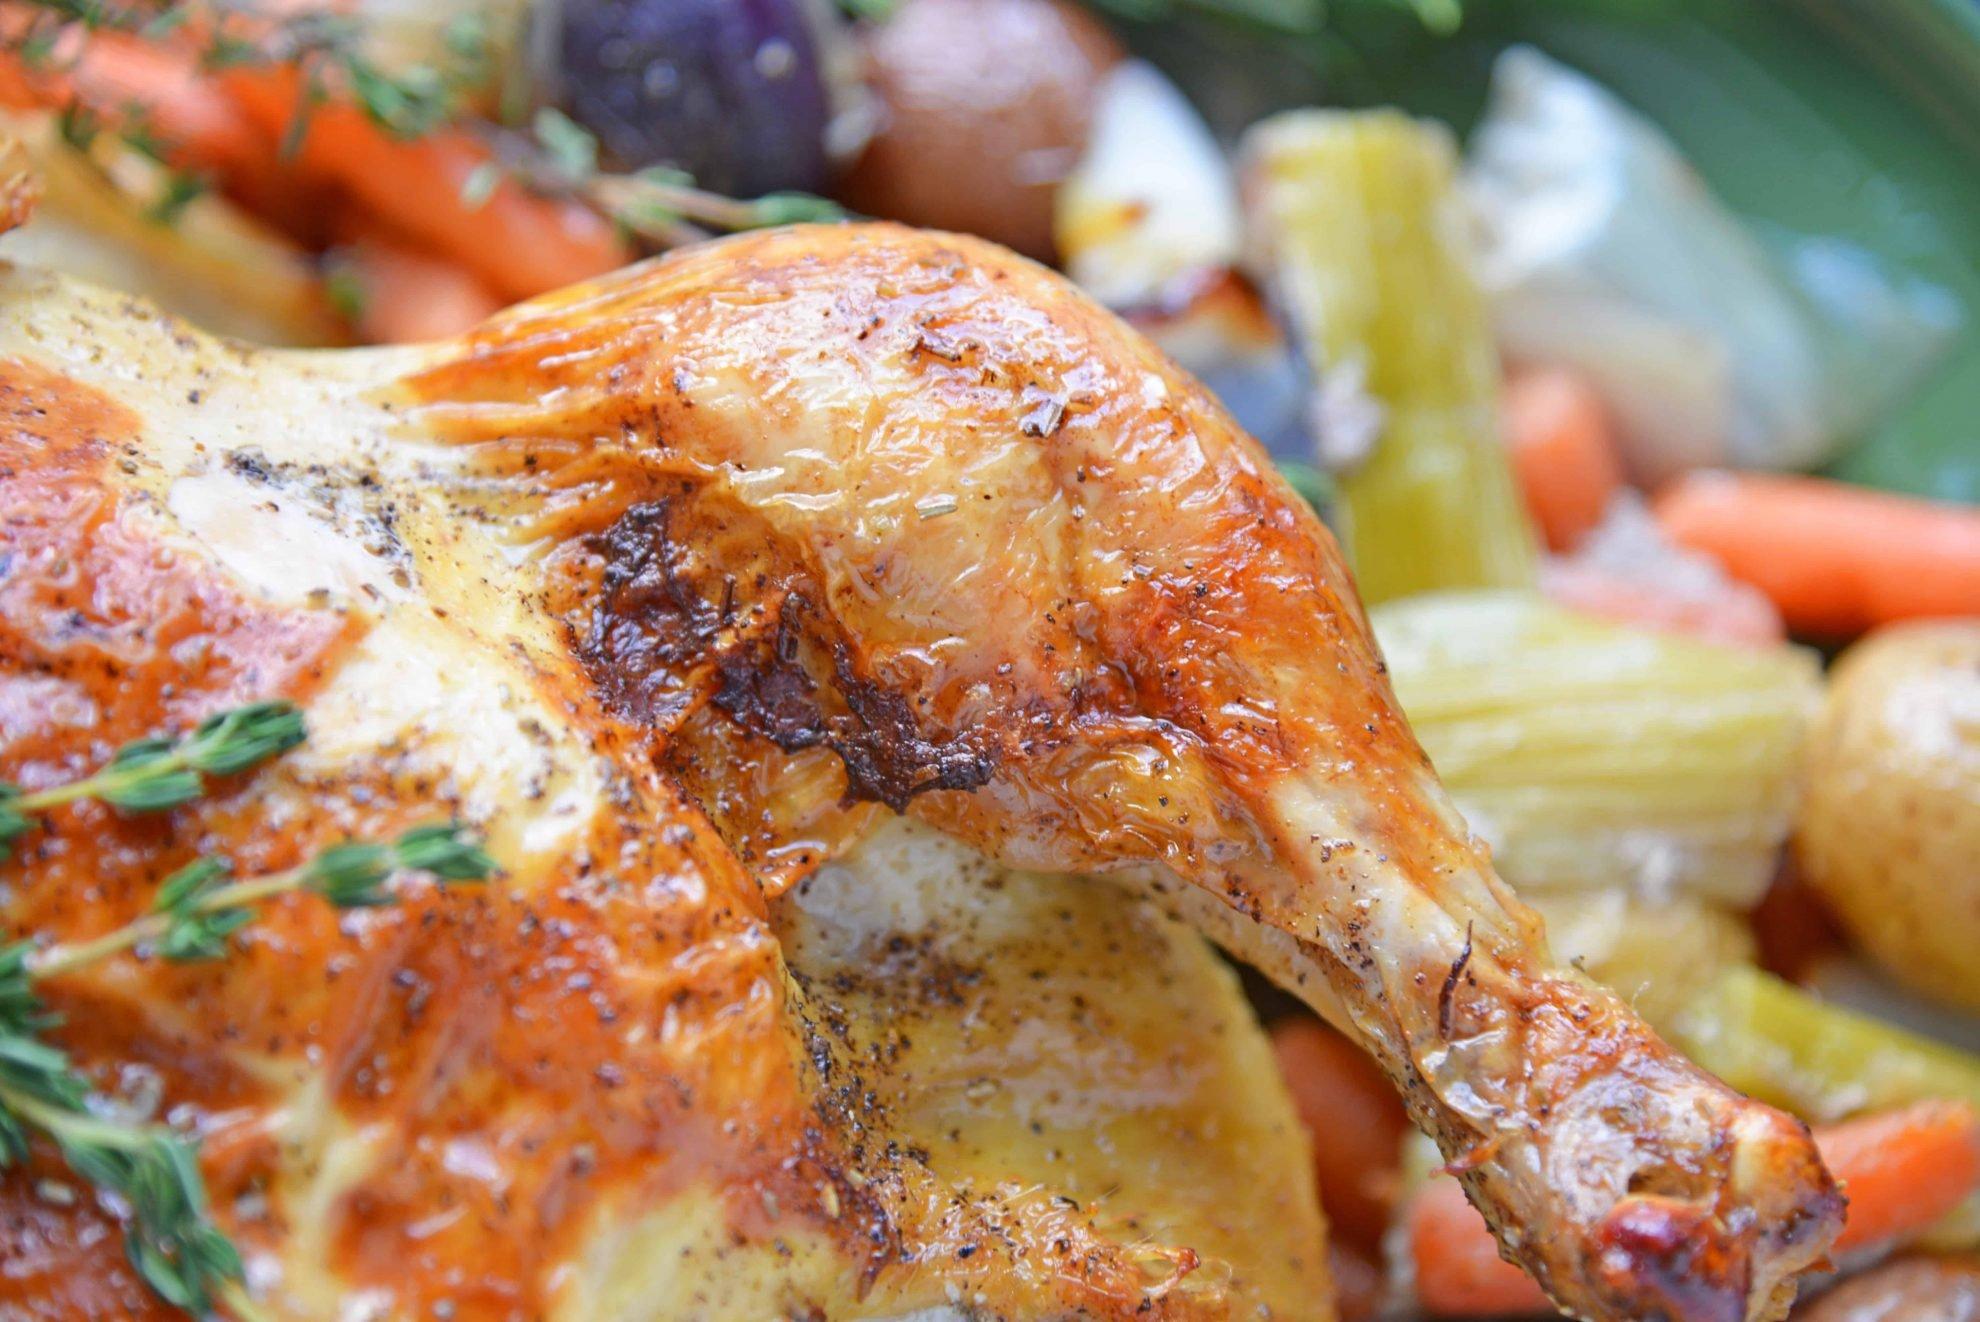 Crispy skin chicken leg